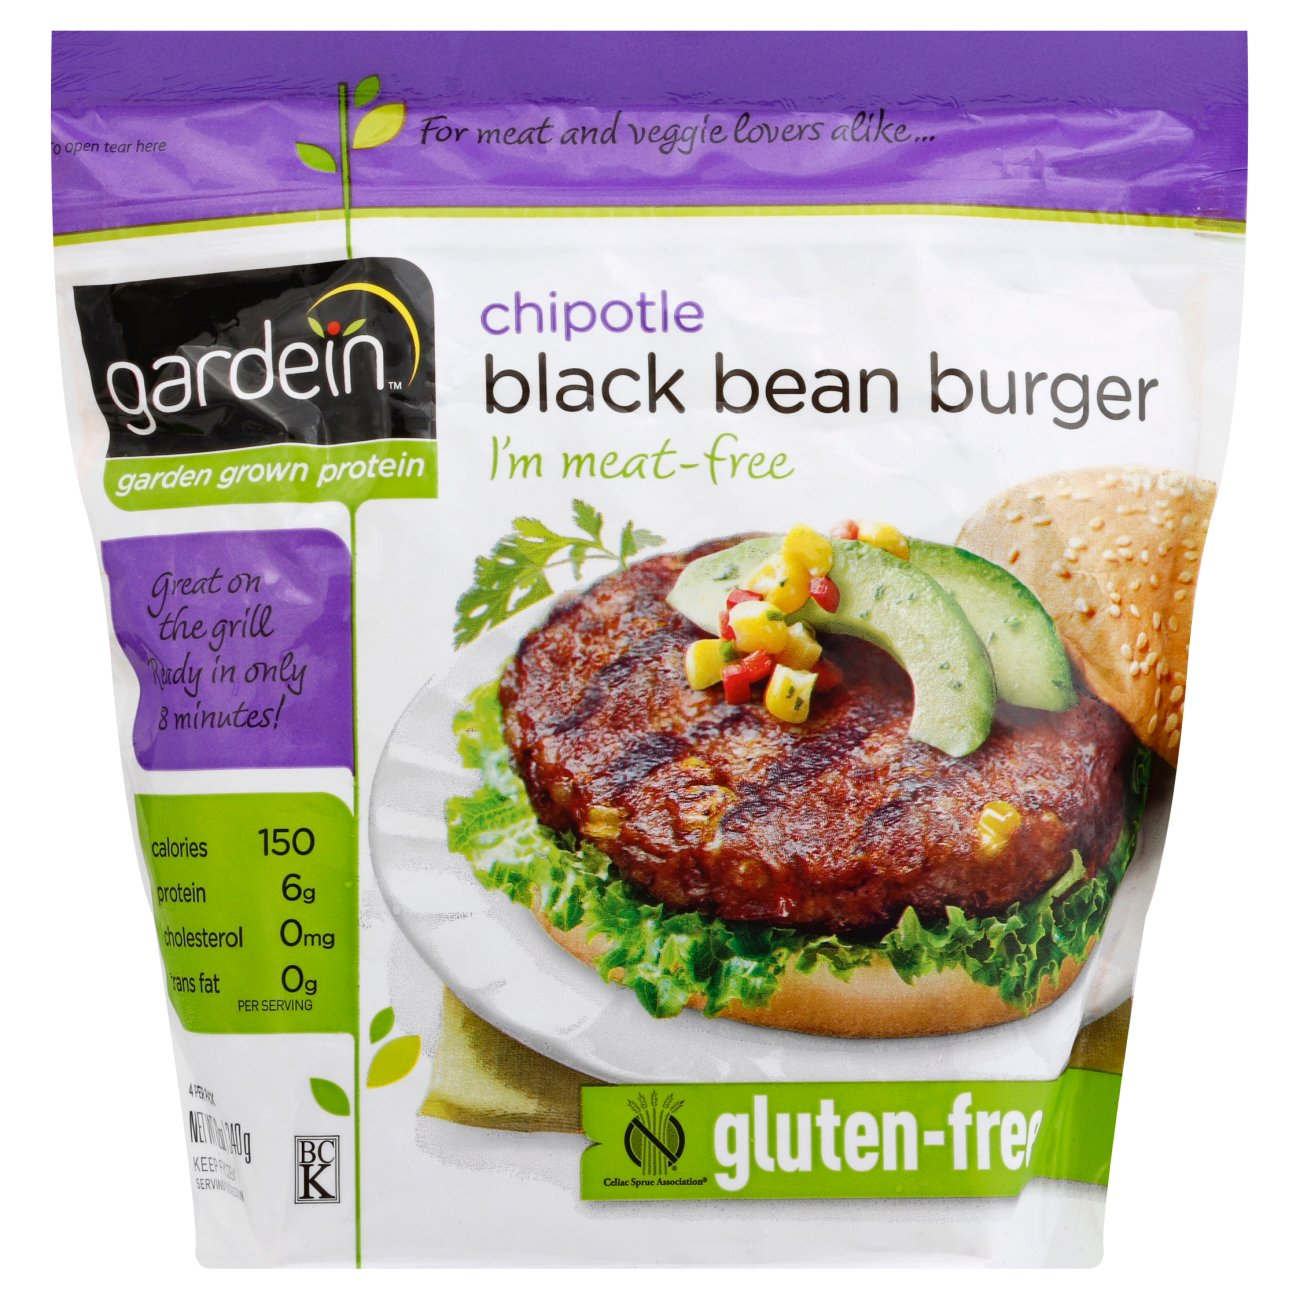 gardein gluten free black bean burger shop family size meals at heb